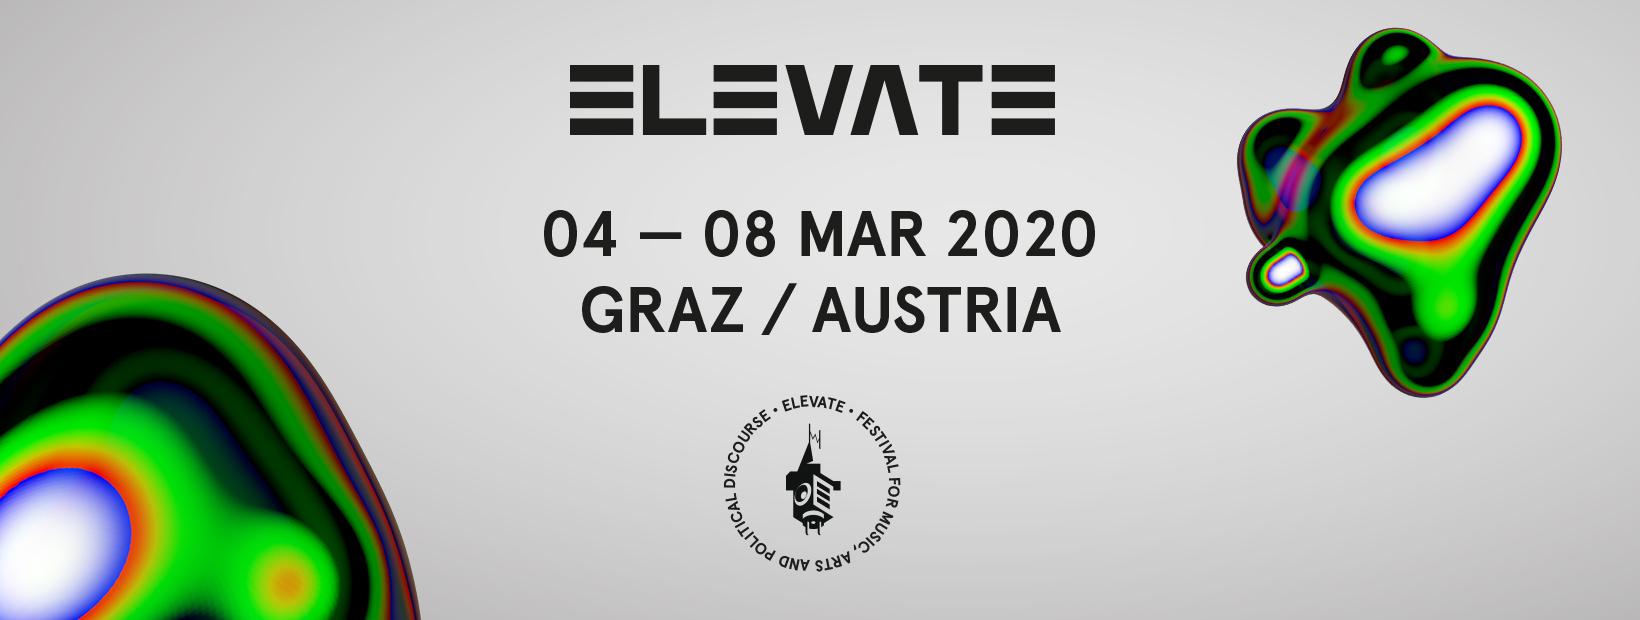 Elevate Festival 2020